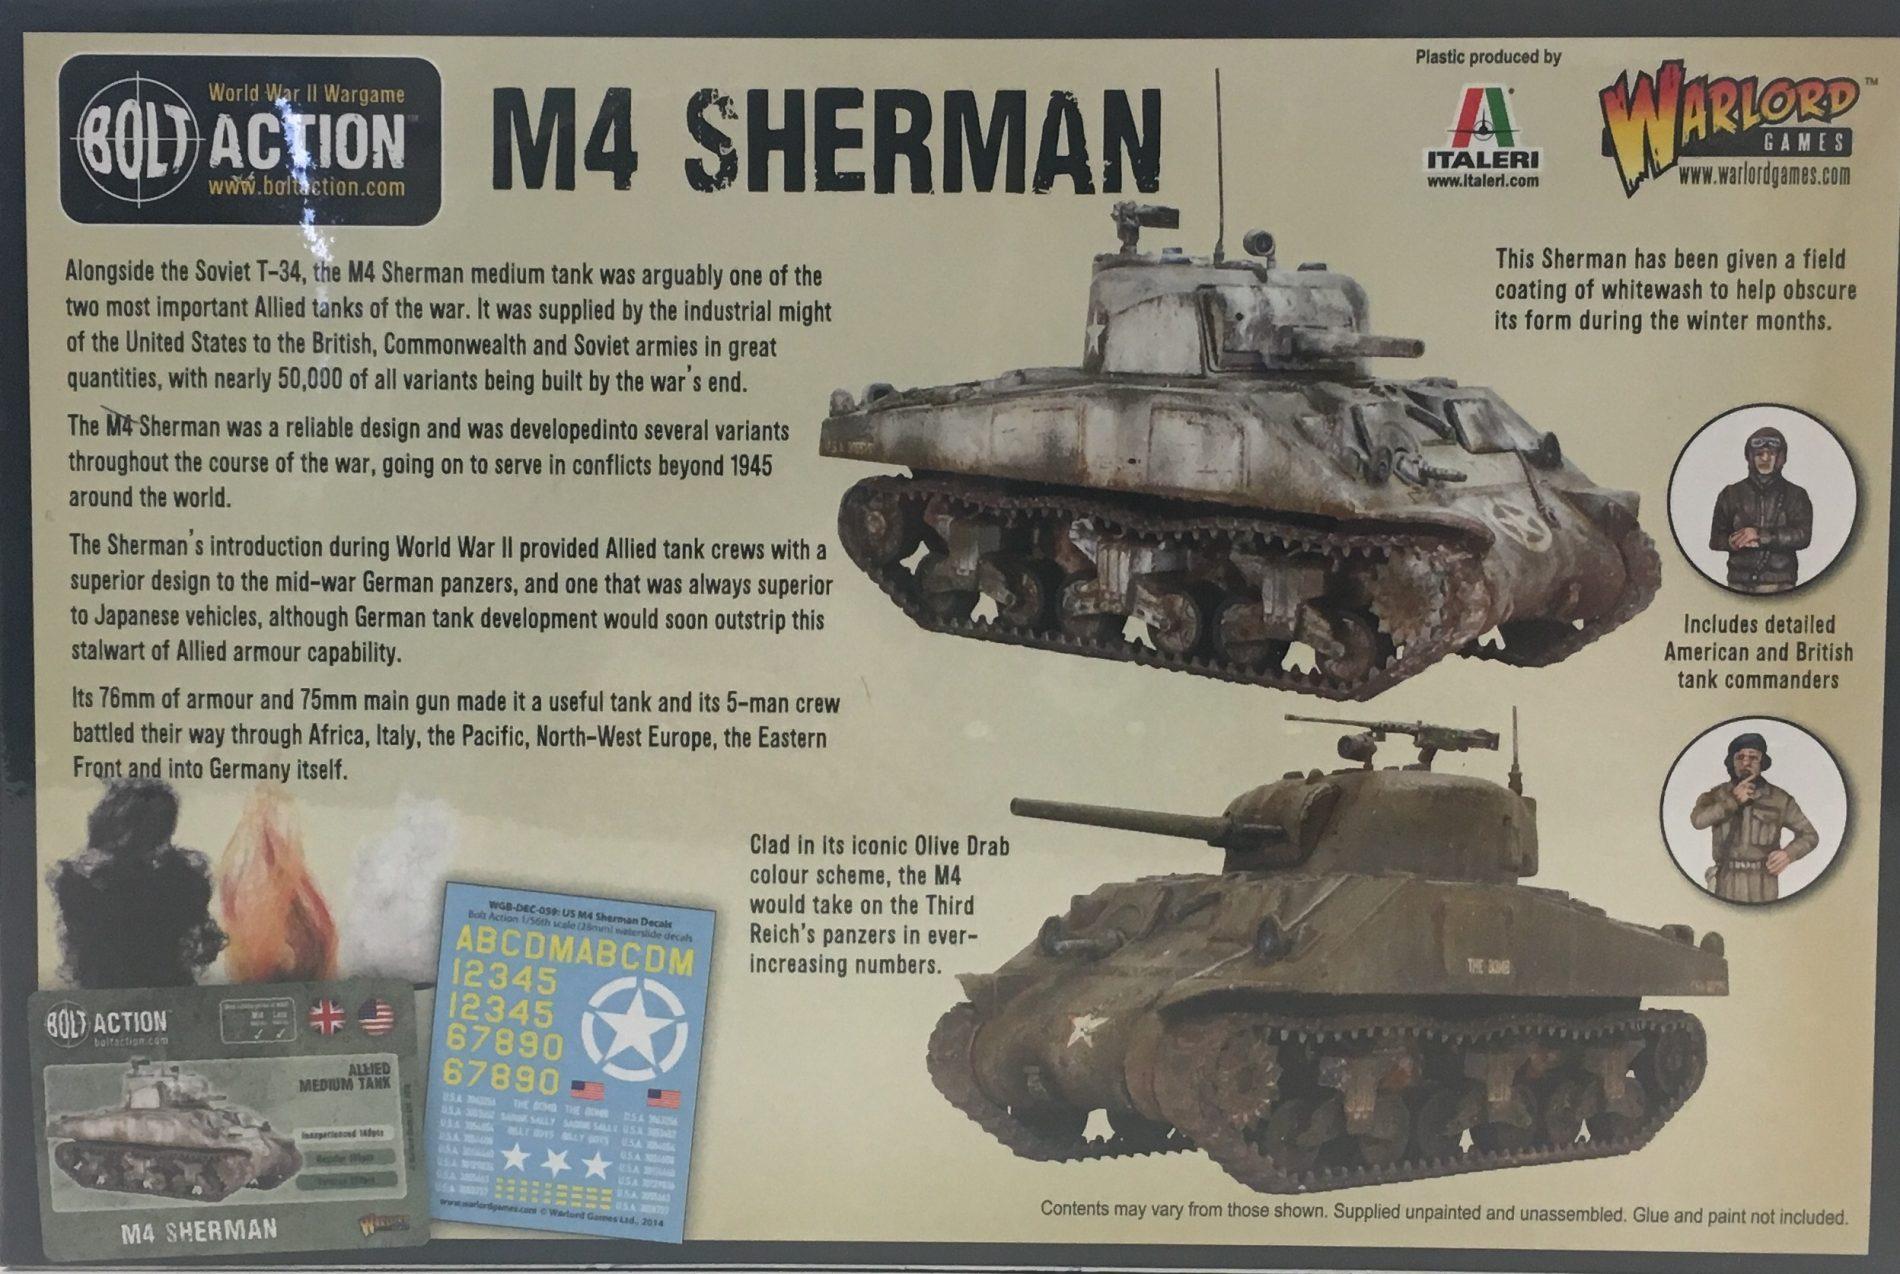 Bolt Action 28mm US M4 Sherman tank